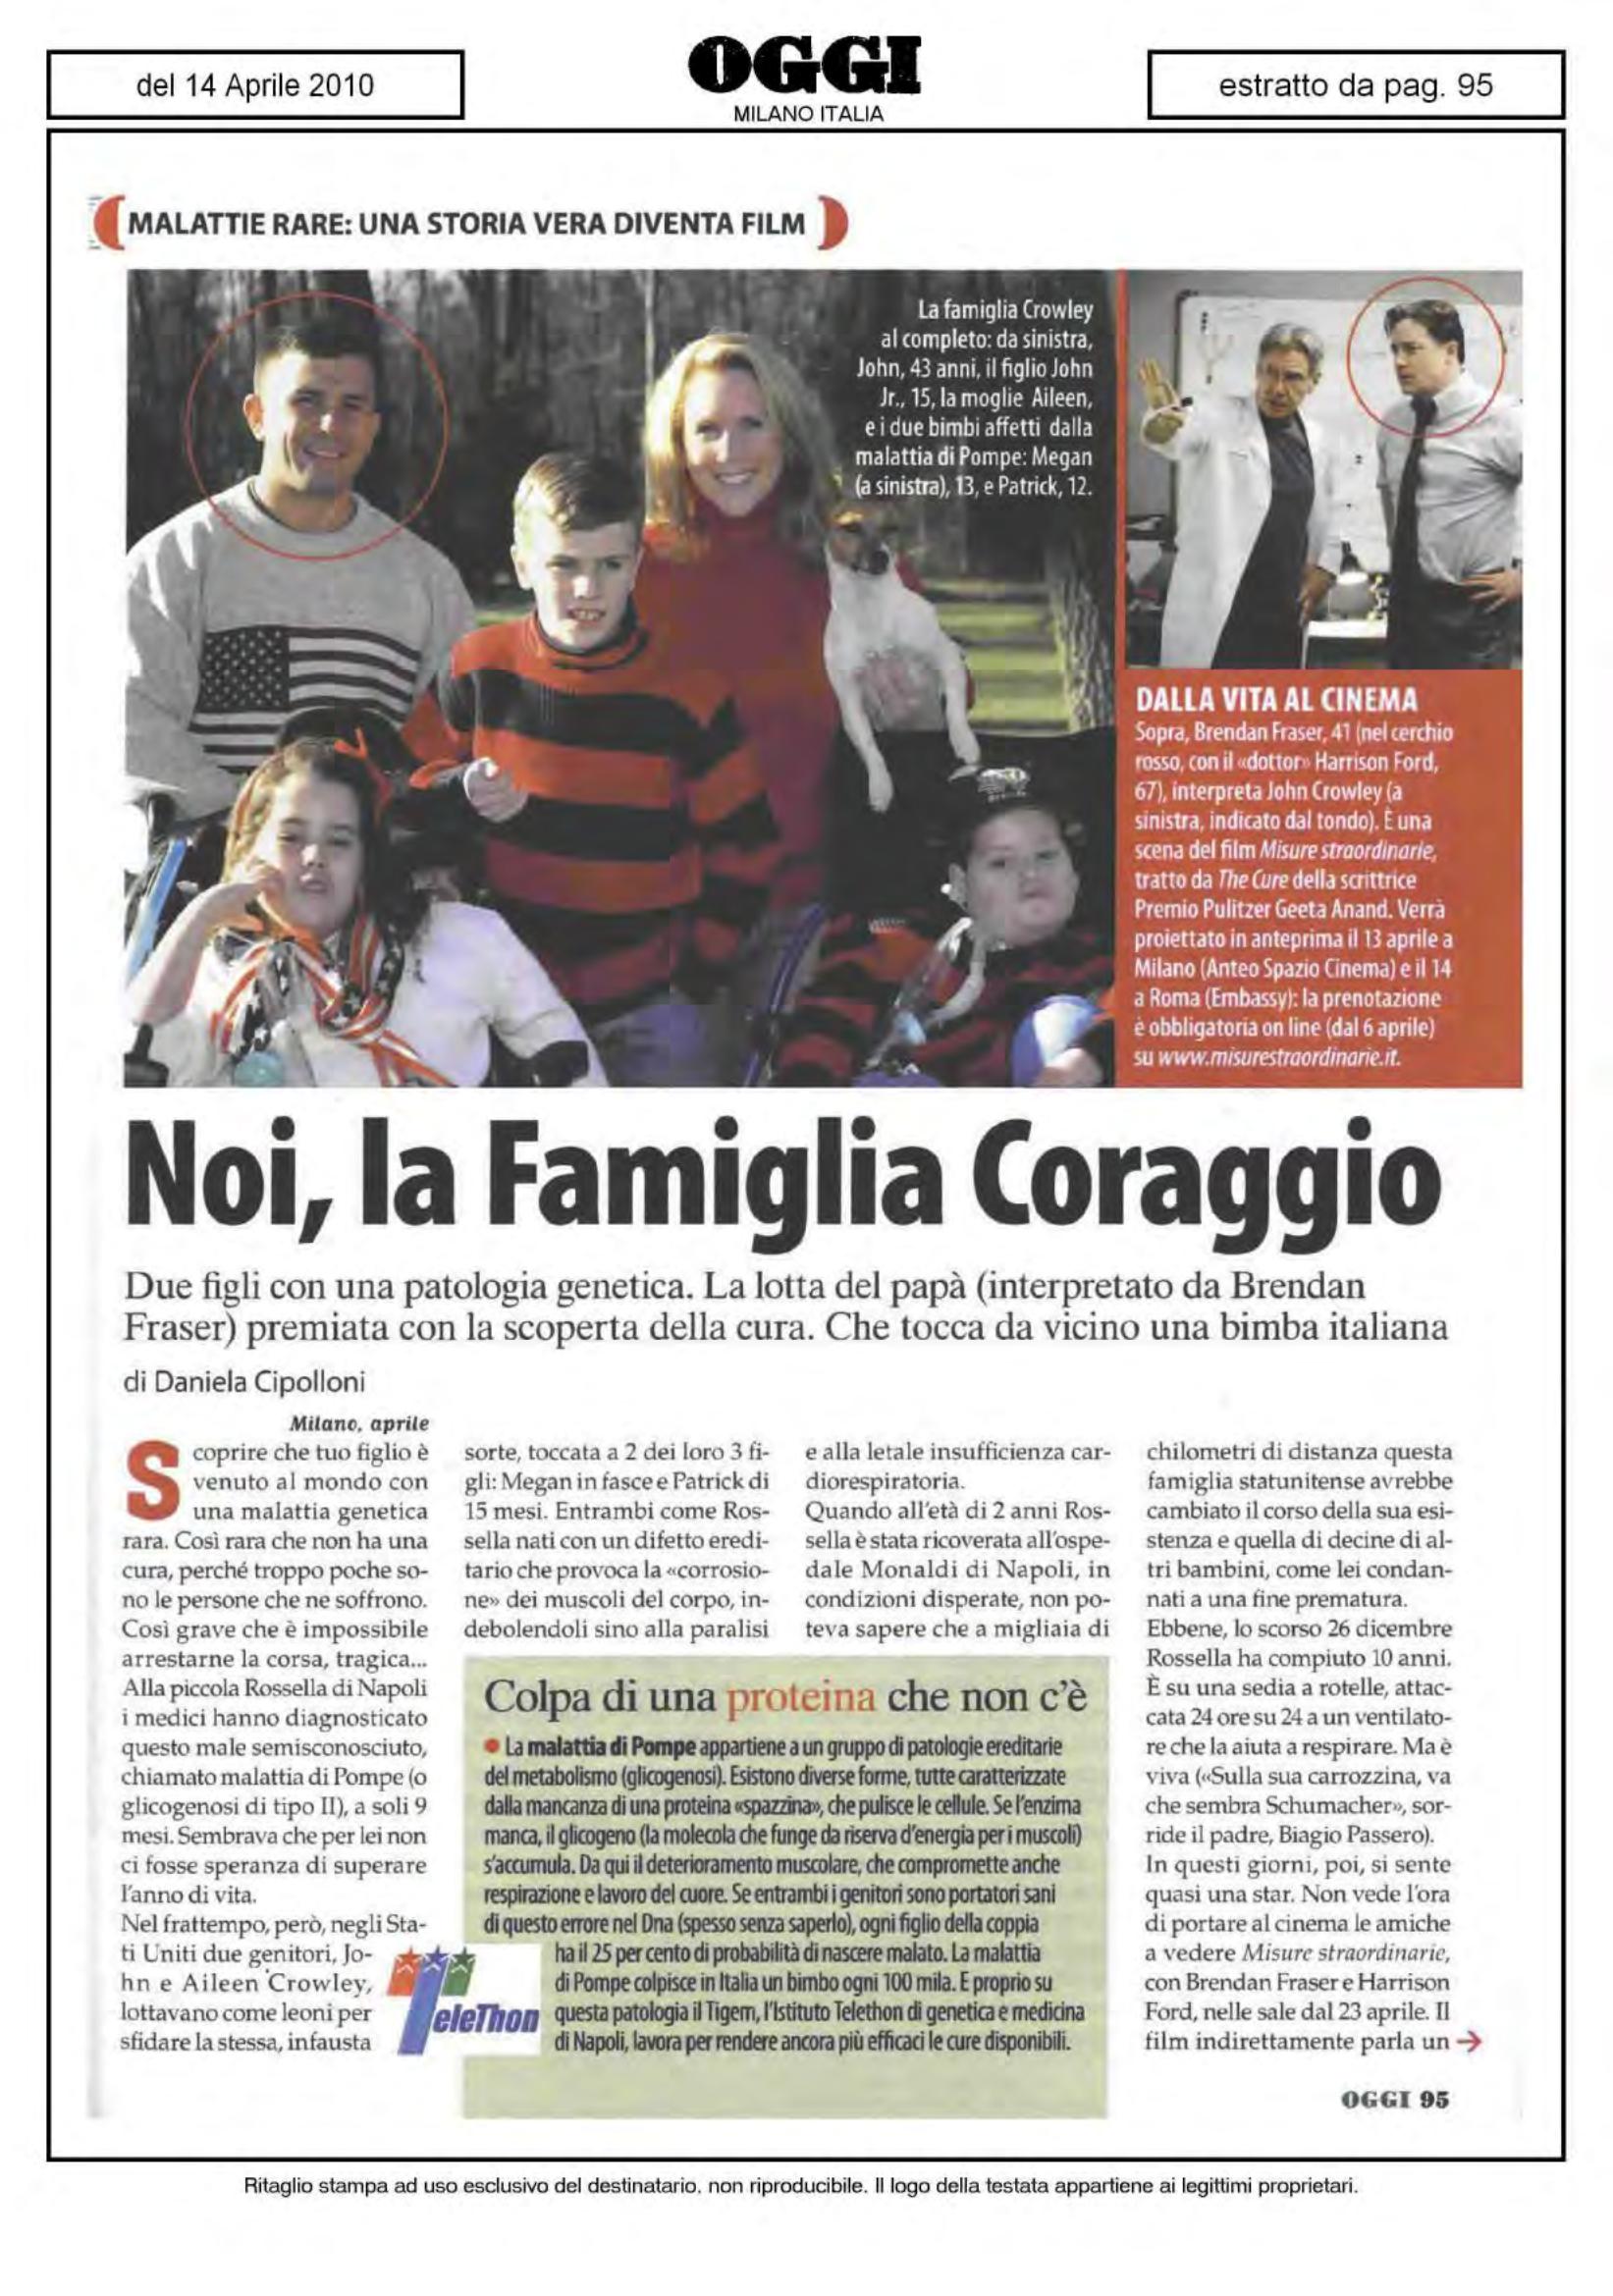 Stampa_20100422_misure straordinarie_Page_39